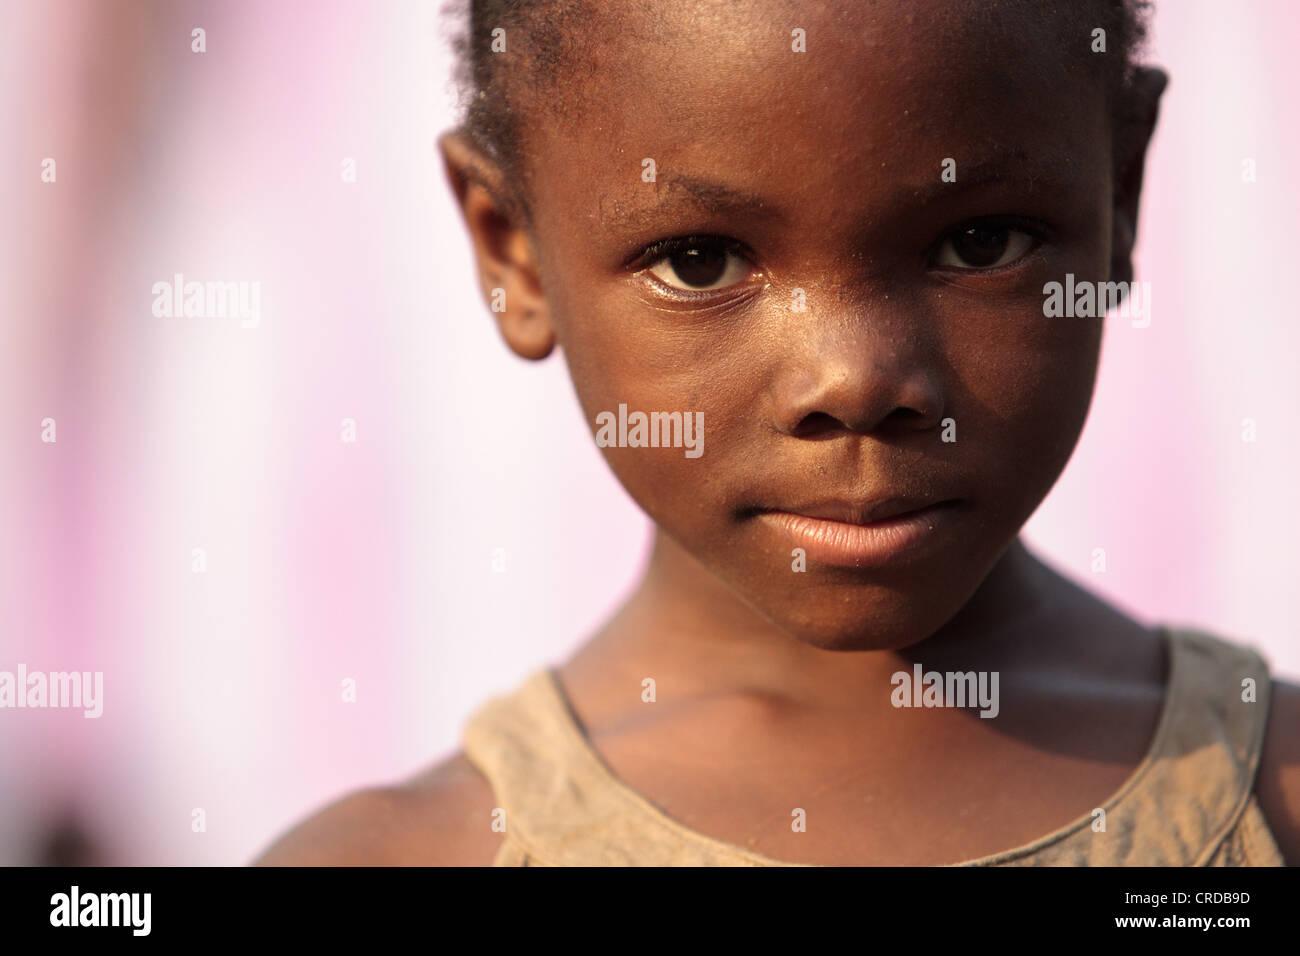 Portrait of a girl in the West Point slum in Monrovia, Montserrado county, Liberia on Monday April 2, 2012. - Stock Image